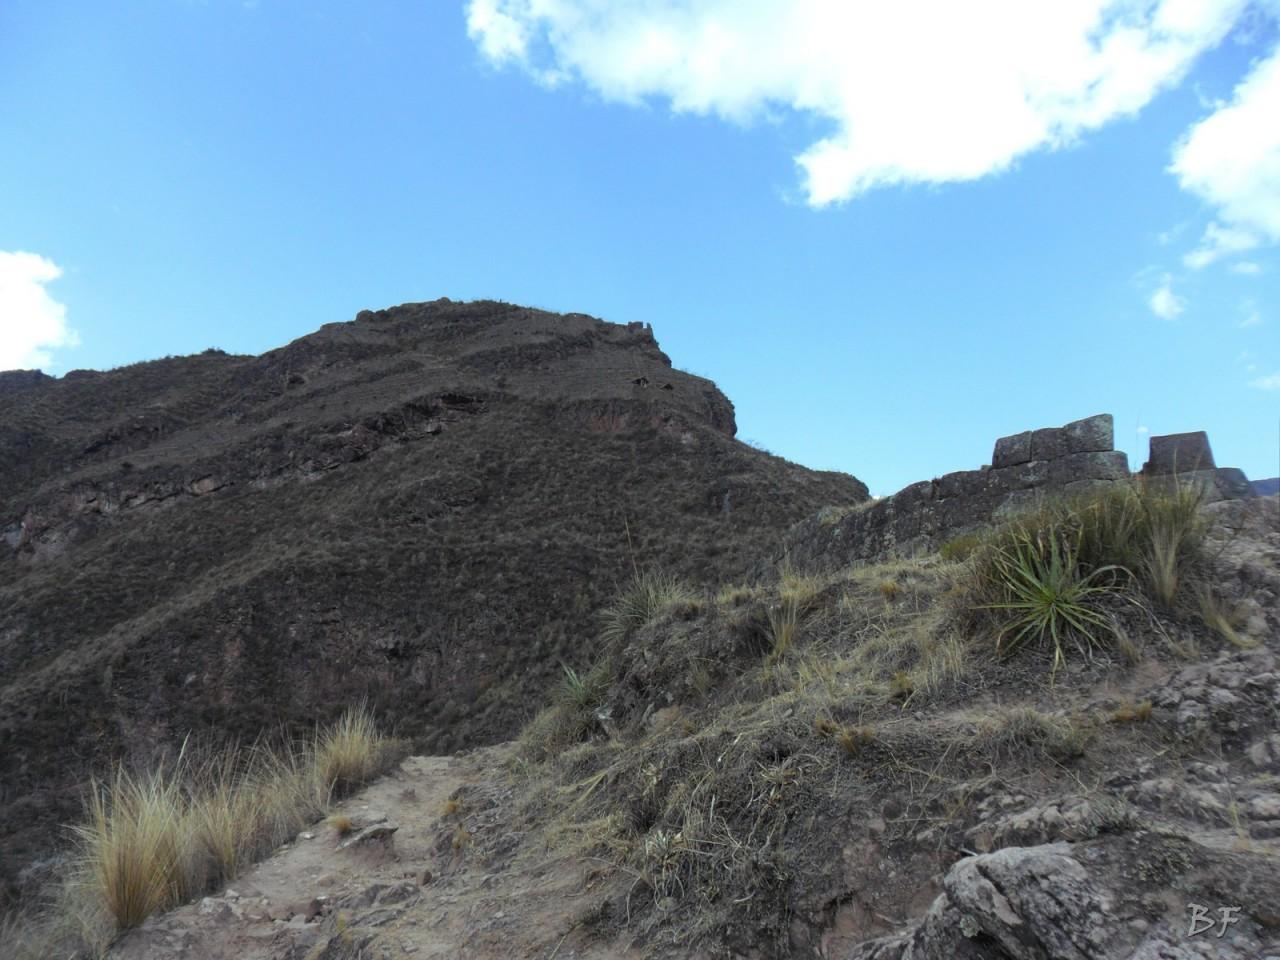 Mura-Poligonali-Megaliti-Altari-Rupestri-Pisac-Cusco-Perù-86